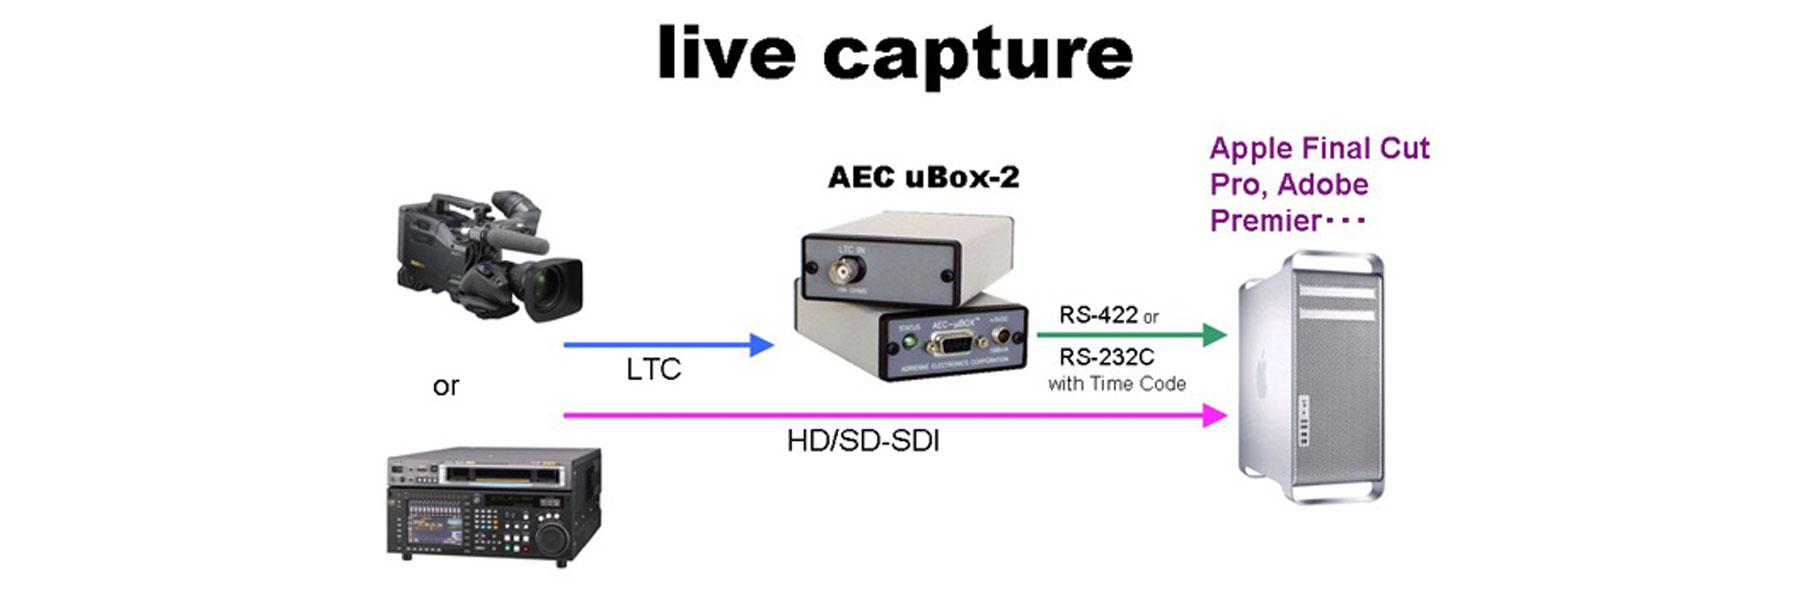 live_capture